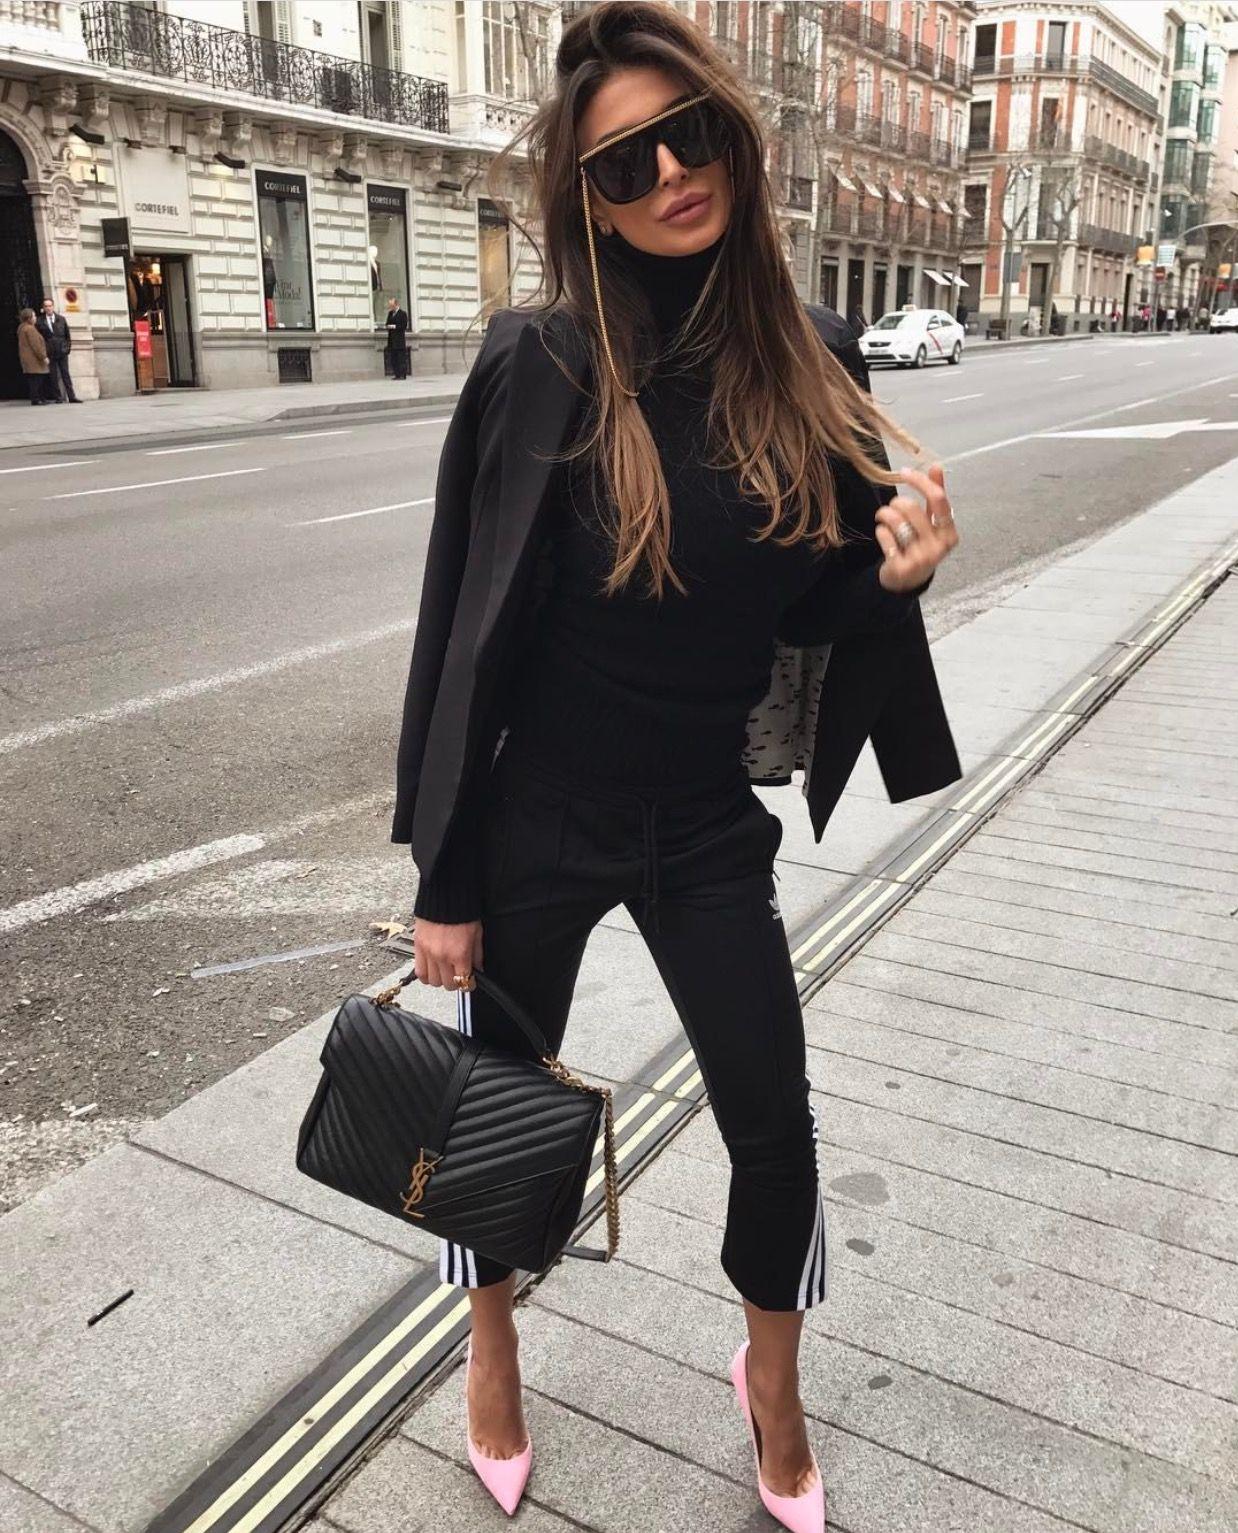 030513a5aa5 Ysl college bag   Handbags in 2019   Fashion, Ysl handbags, Ysl bag